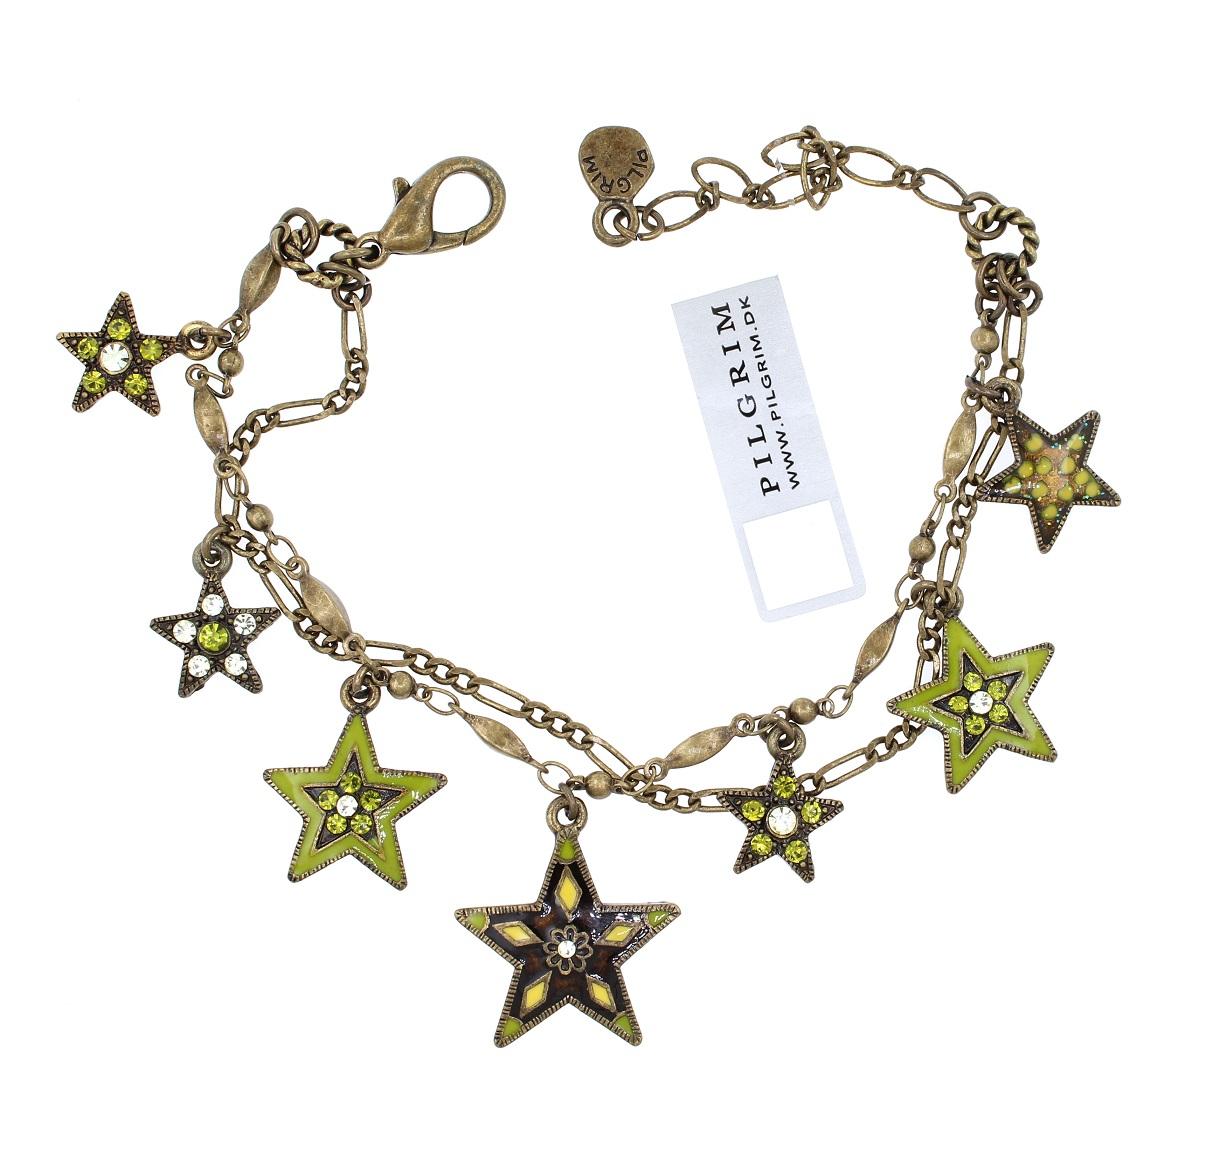 PILGRIM - STARS - Double Strand Charm Bracelet - Gold Plate/Green Swarovski BNWT